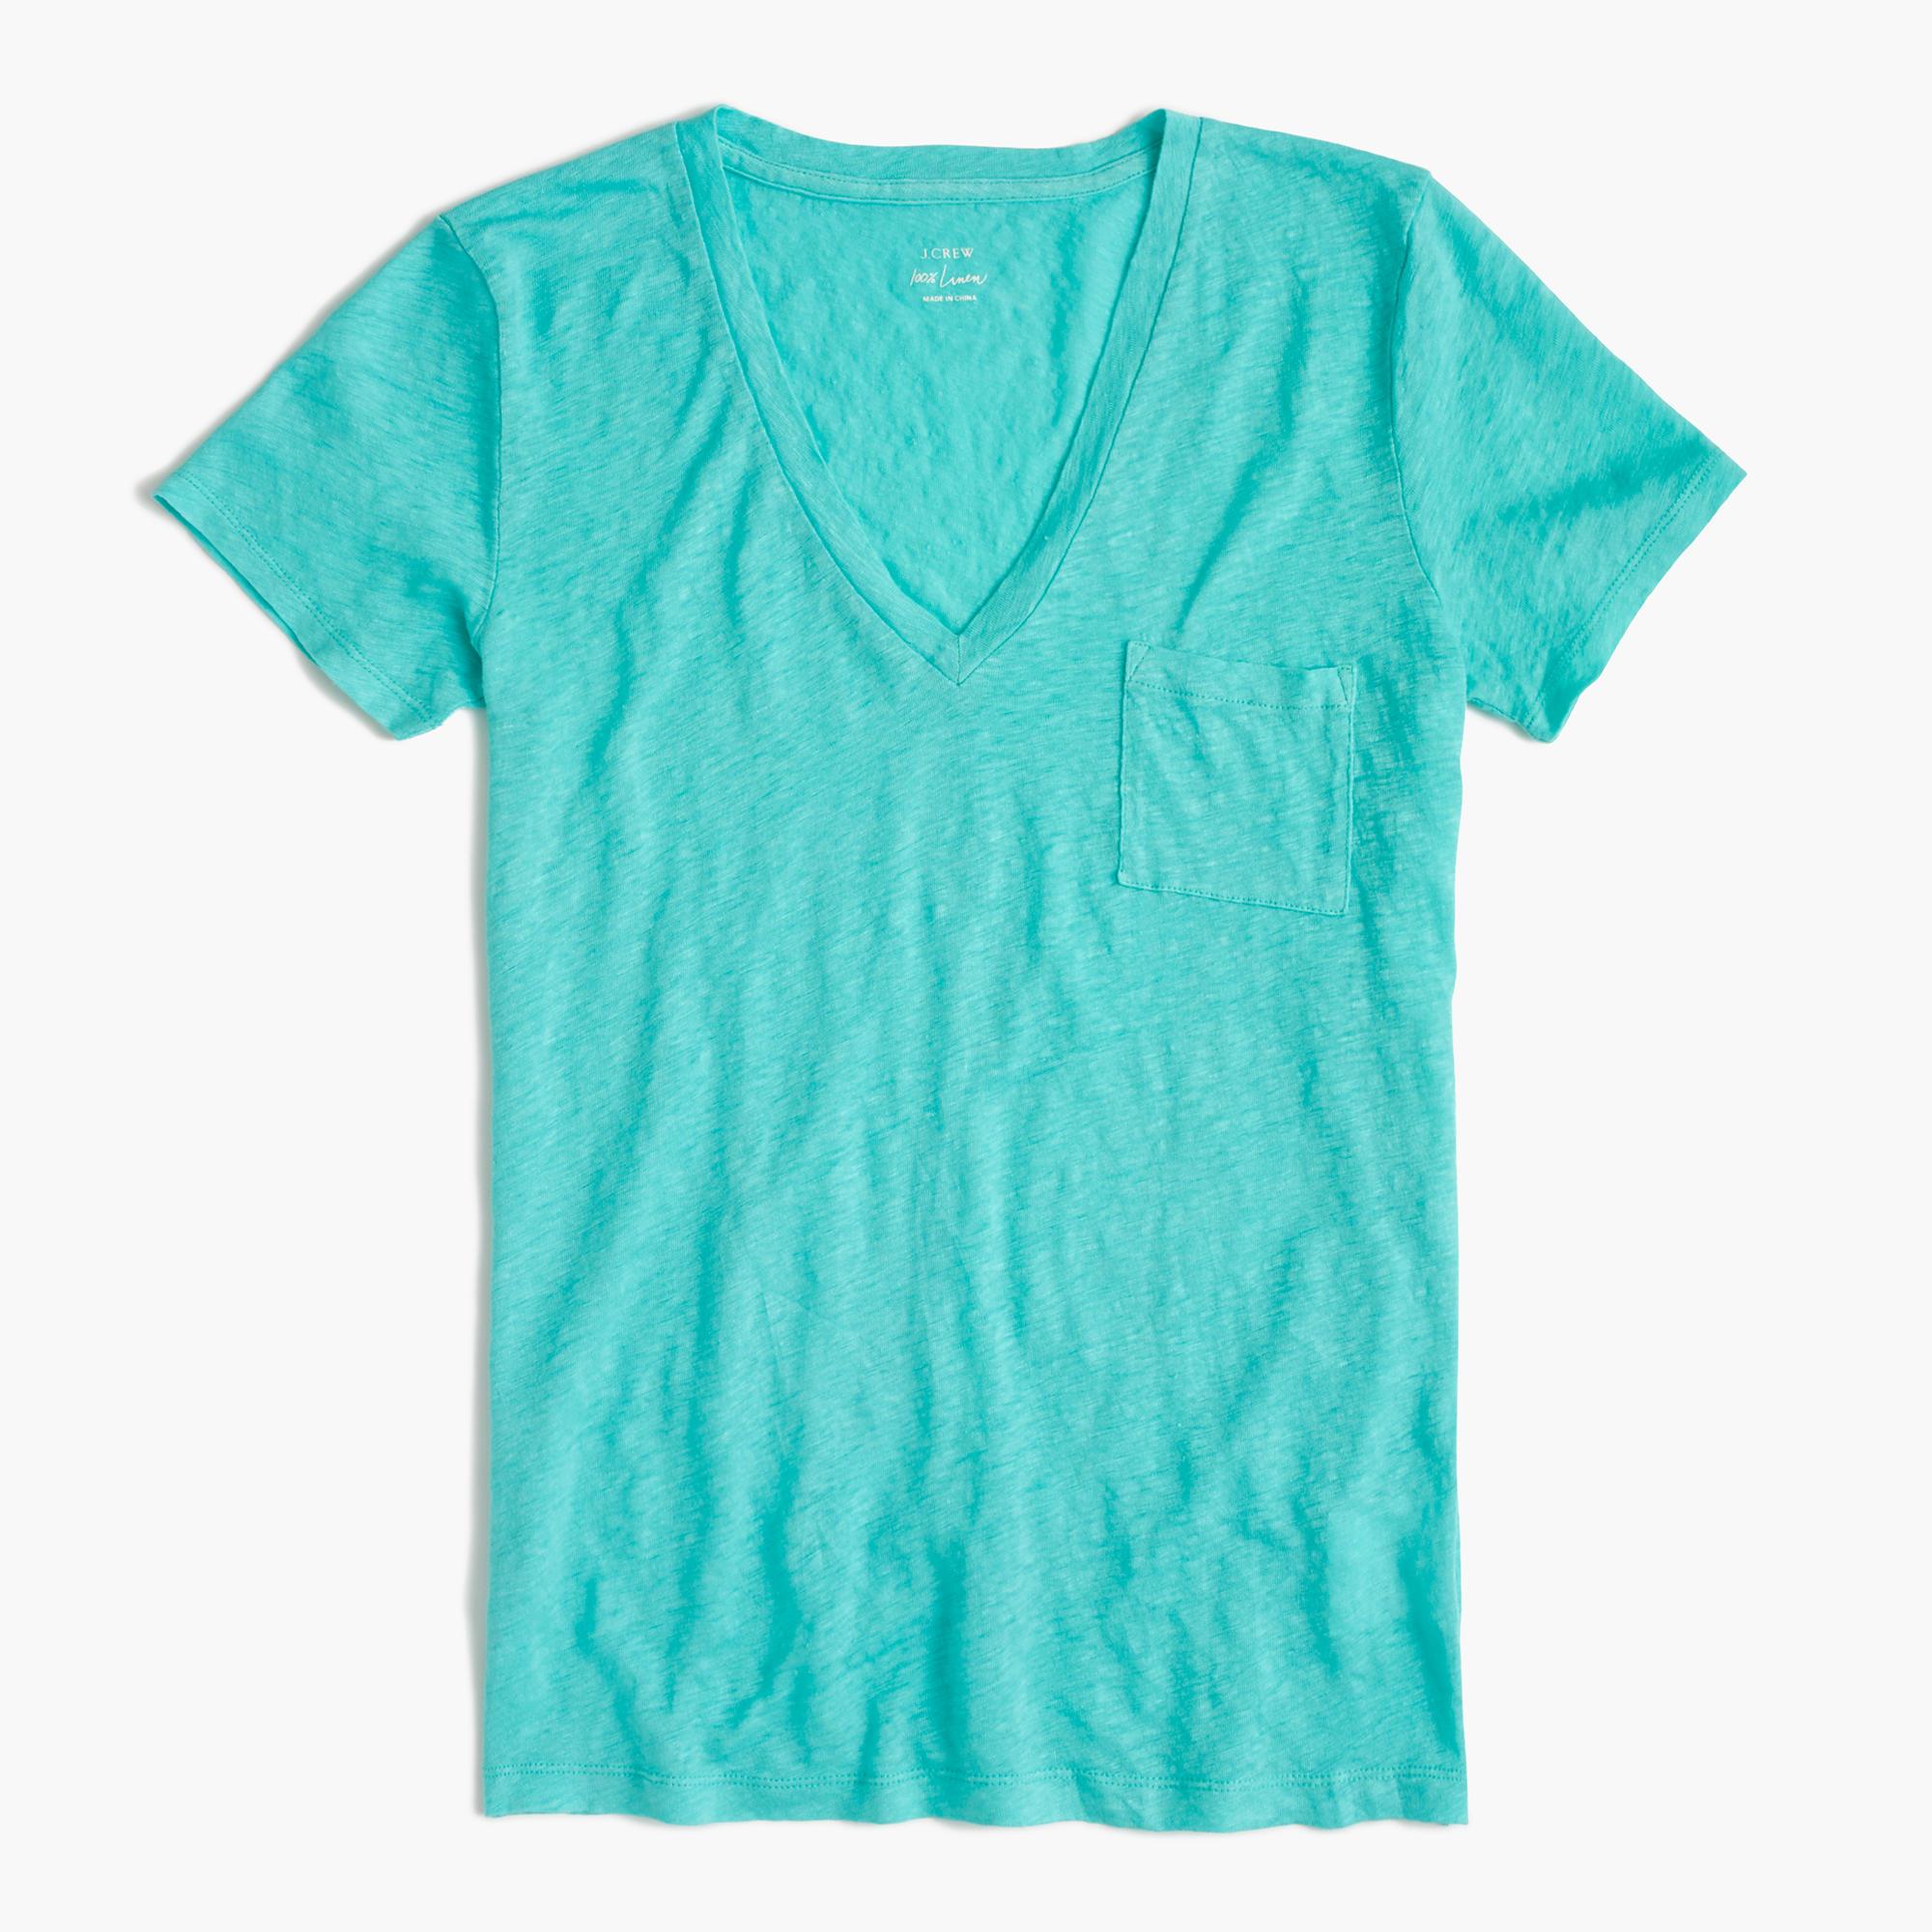 e97df2df8f6220 J.Crew Linen V-neck Pocket T-shirt in Green - Lyst